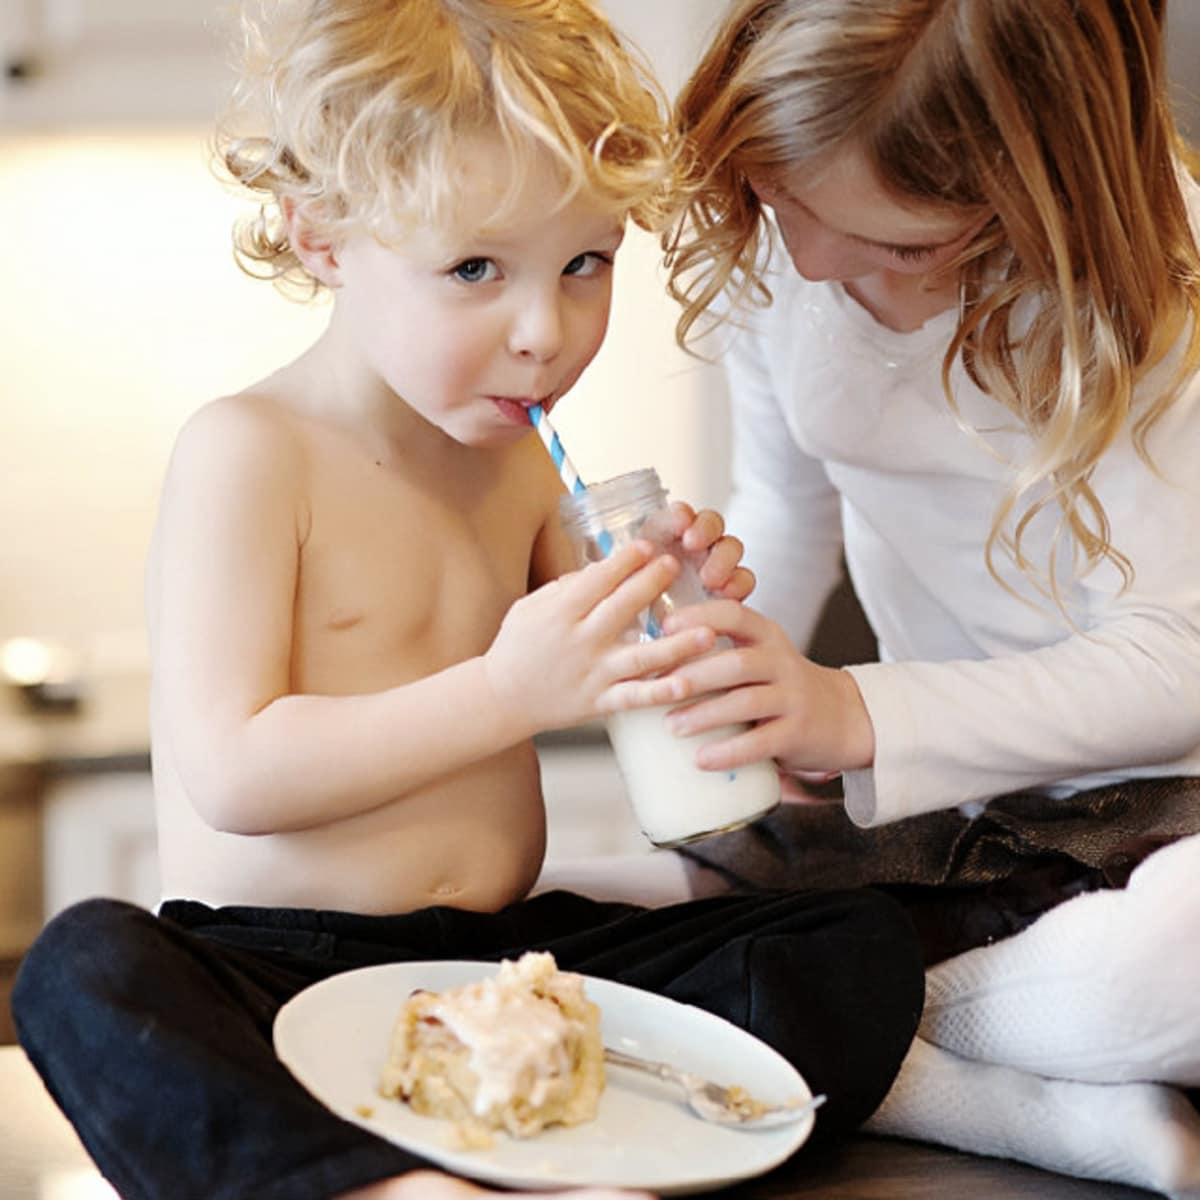 Kids eating RoRo's Cinn-A-Rolls